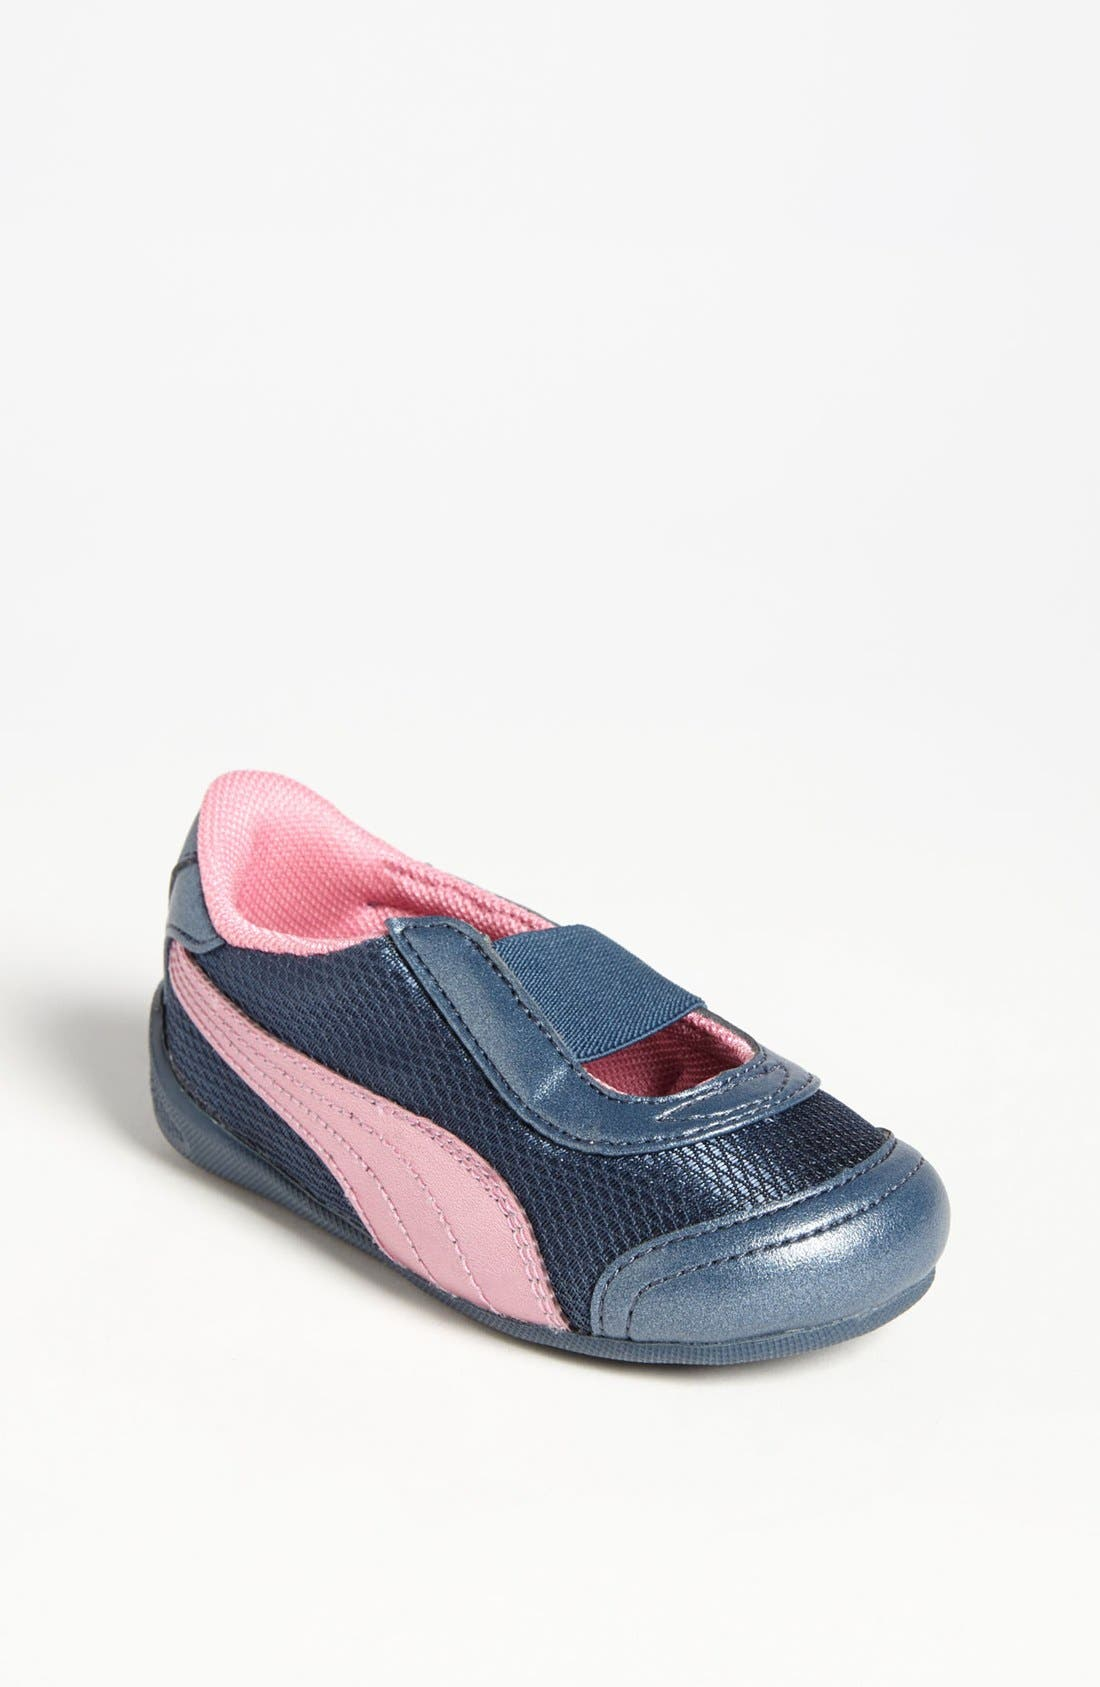 Main Image - PUMA 'Sneakerina' Slip-On (Walker, Toddler & Little Kid)(Nordstrom Exclusive)